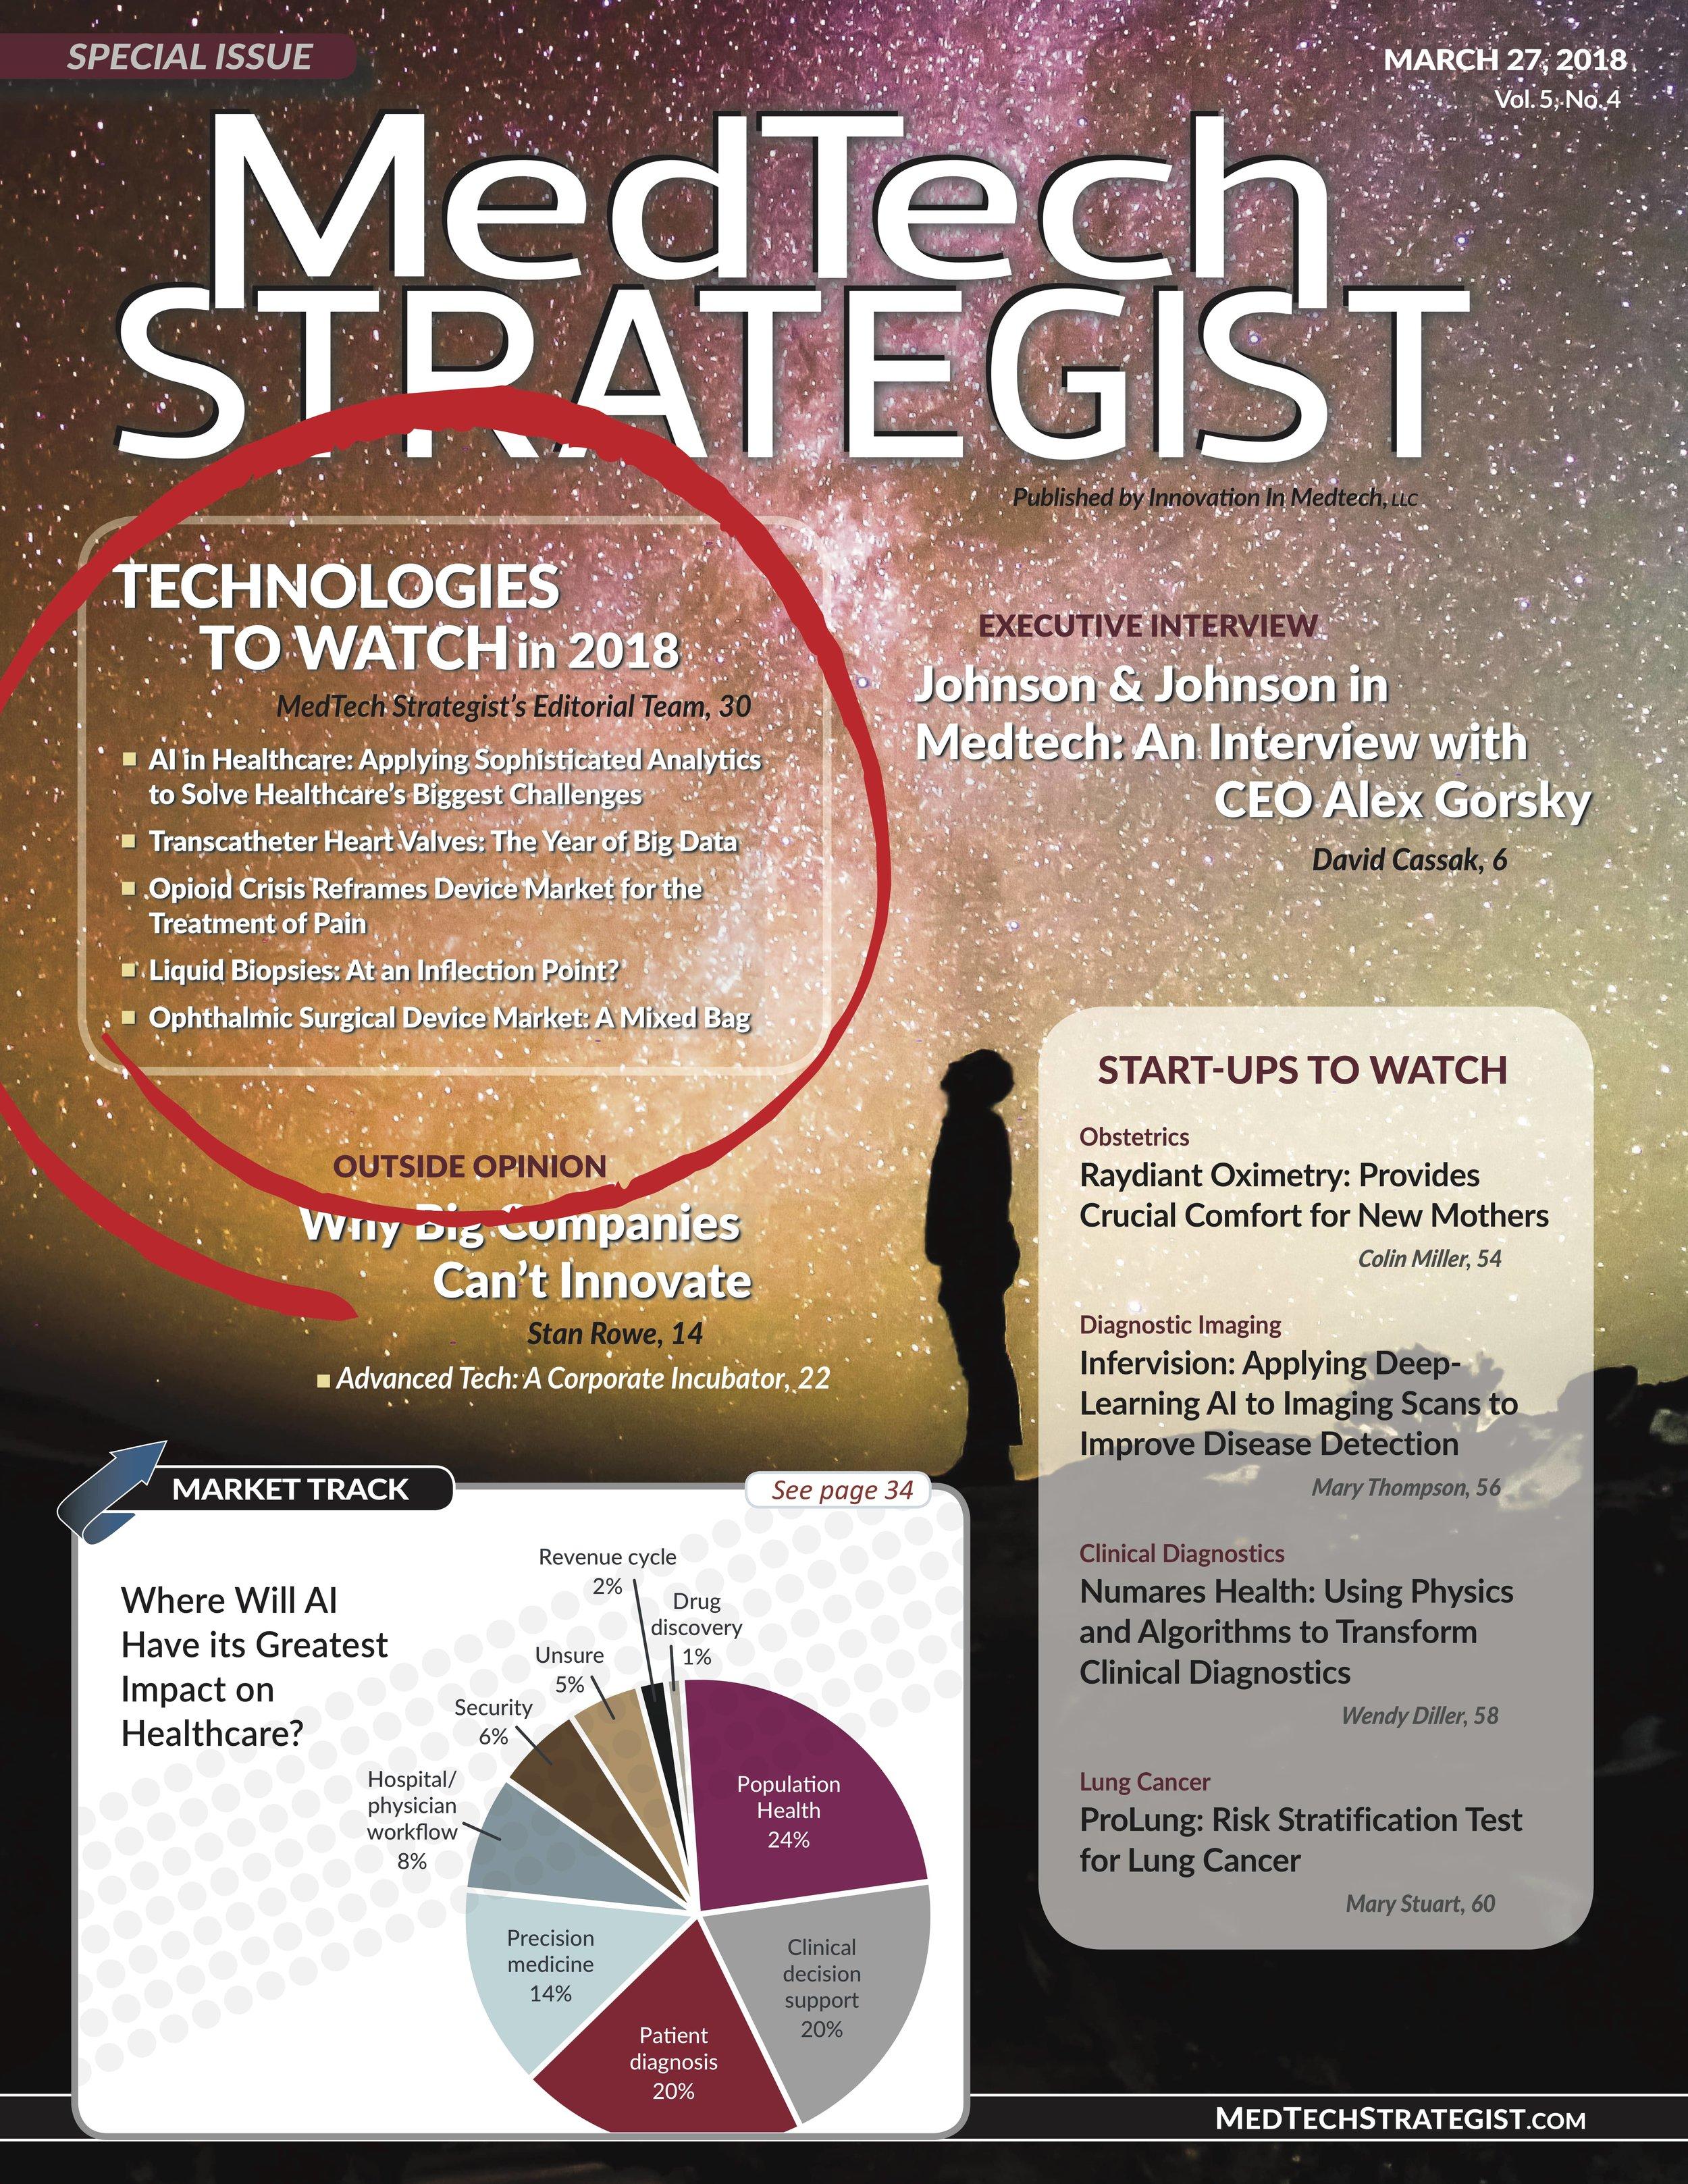 MedTech Strategist Technologies to Watch 2018-min (1).jpg